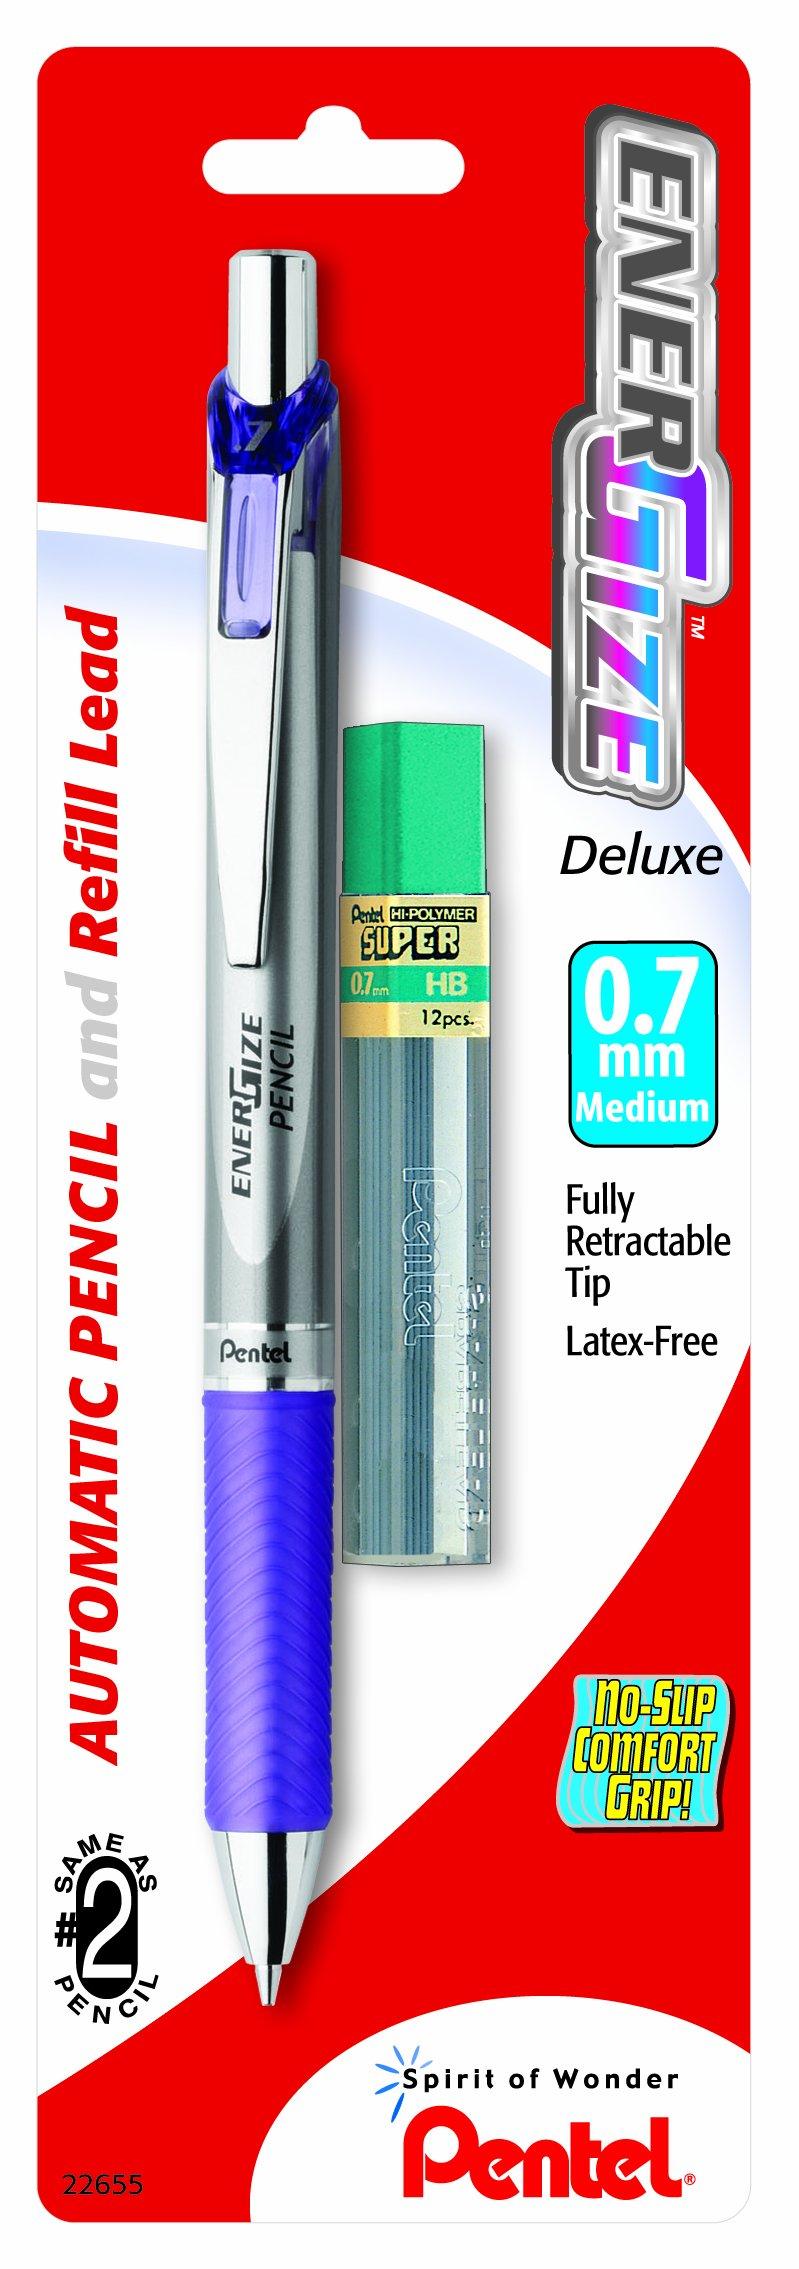 Pentel Energize automática Lápiz con plomo,0.7mm